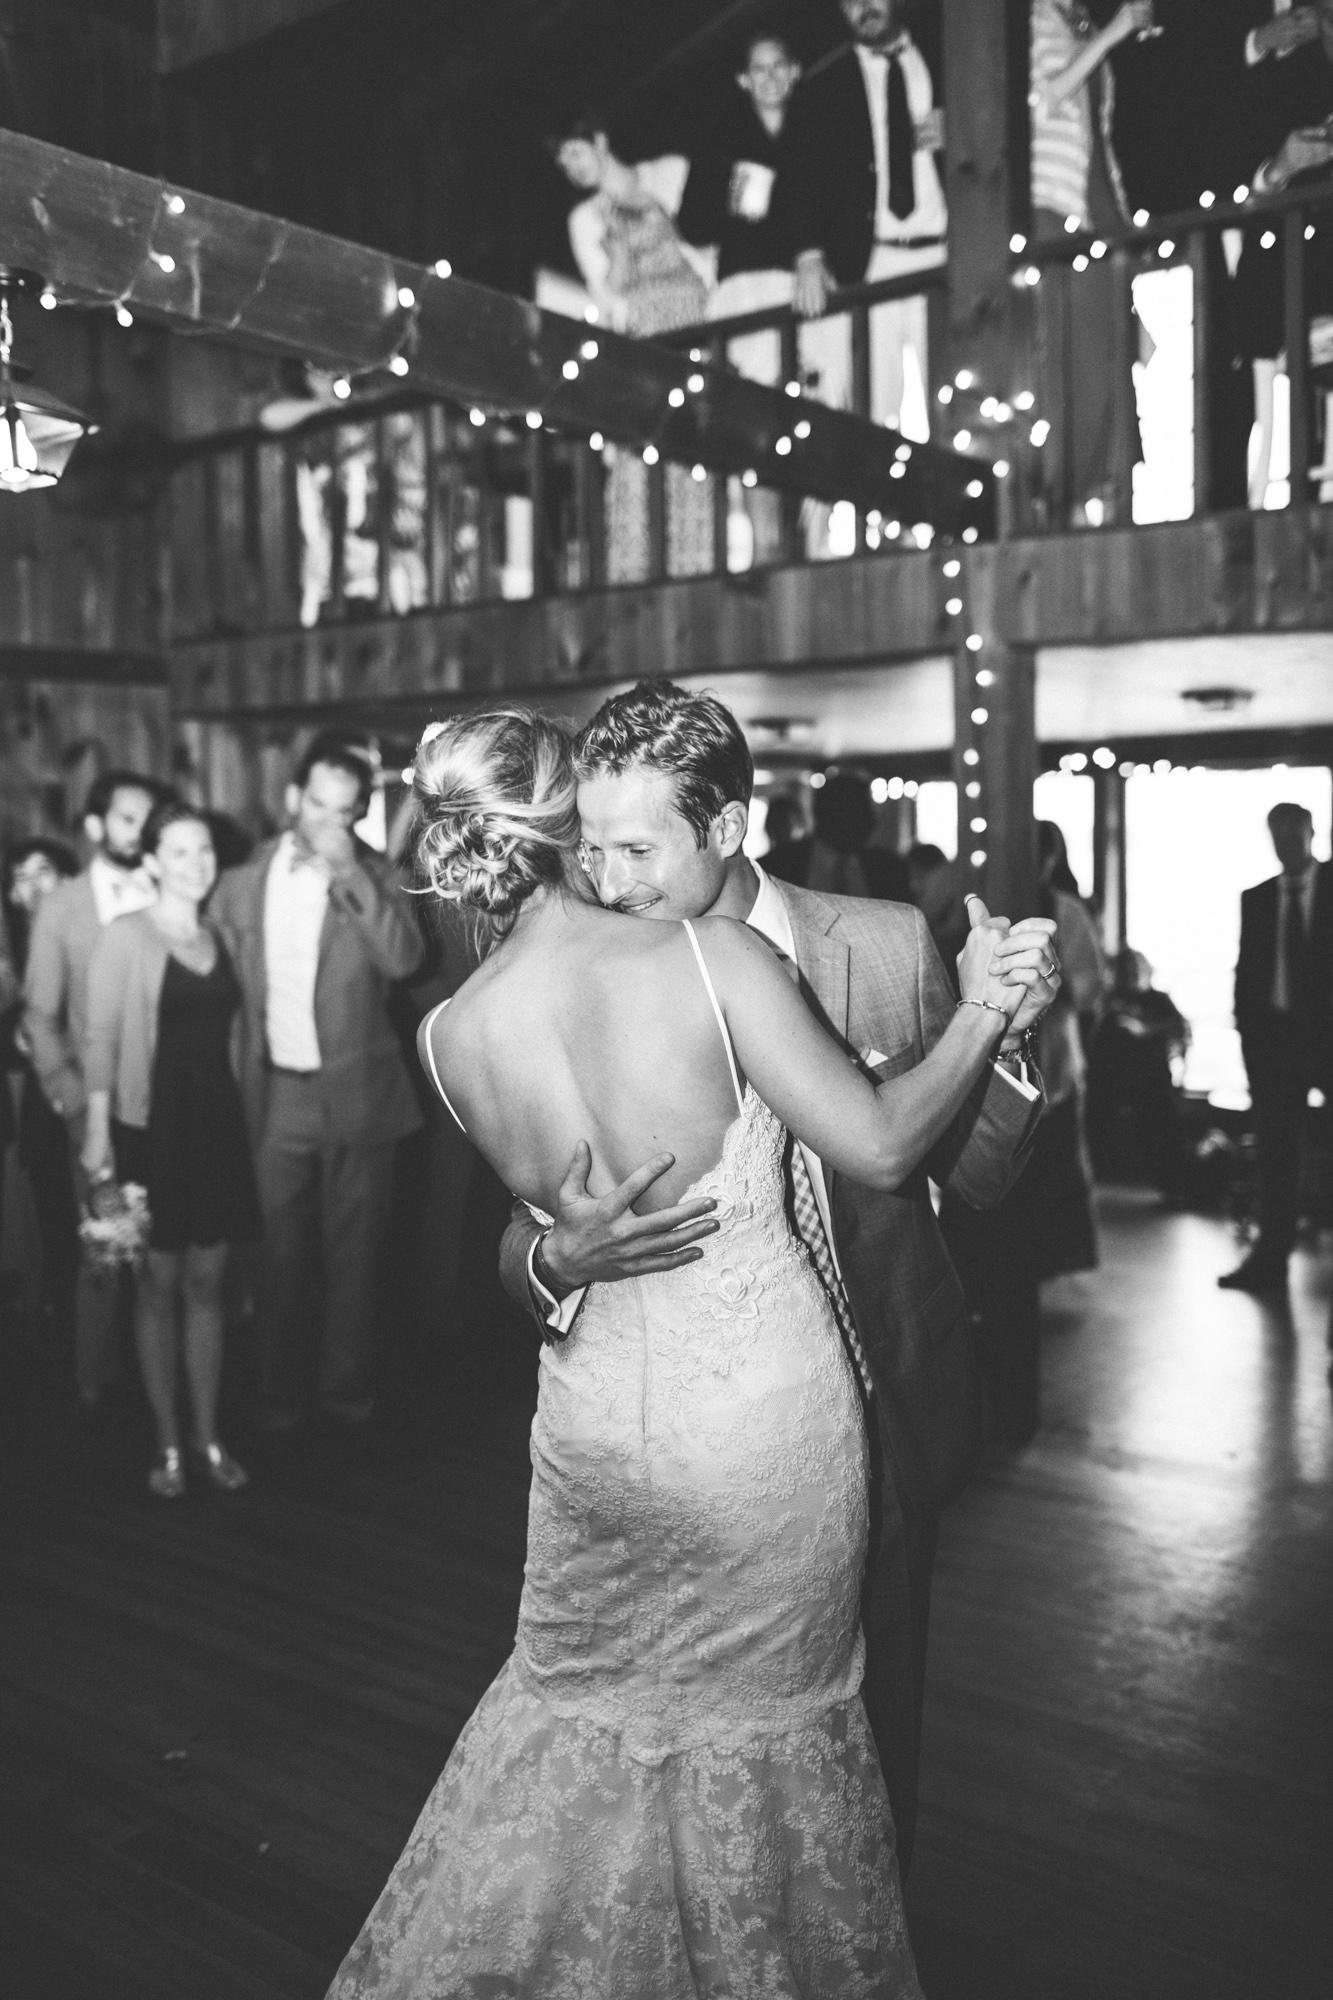 0620_jamiemercurio_boothbay_wedding_maine-155.jpg